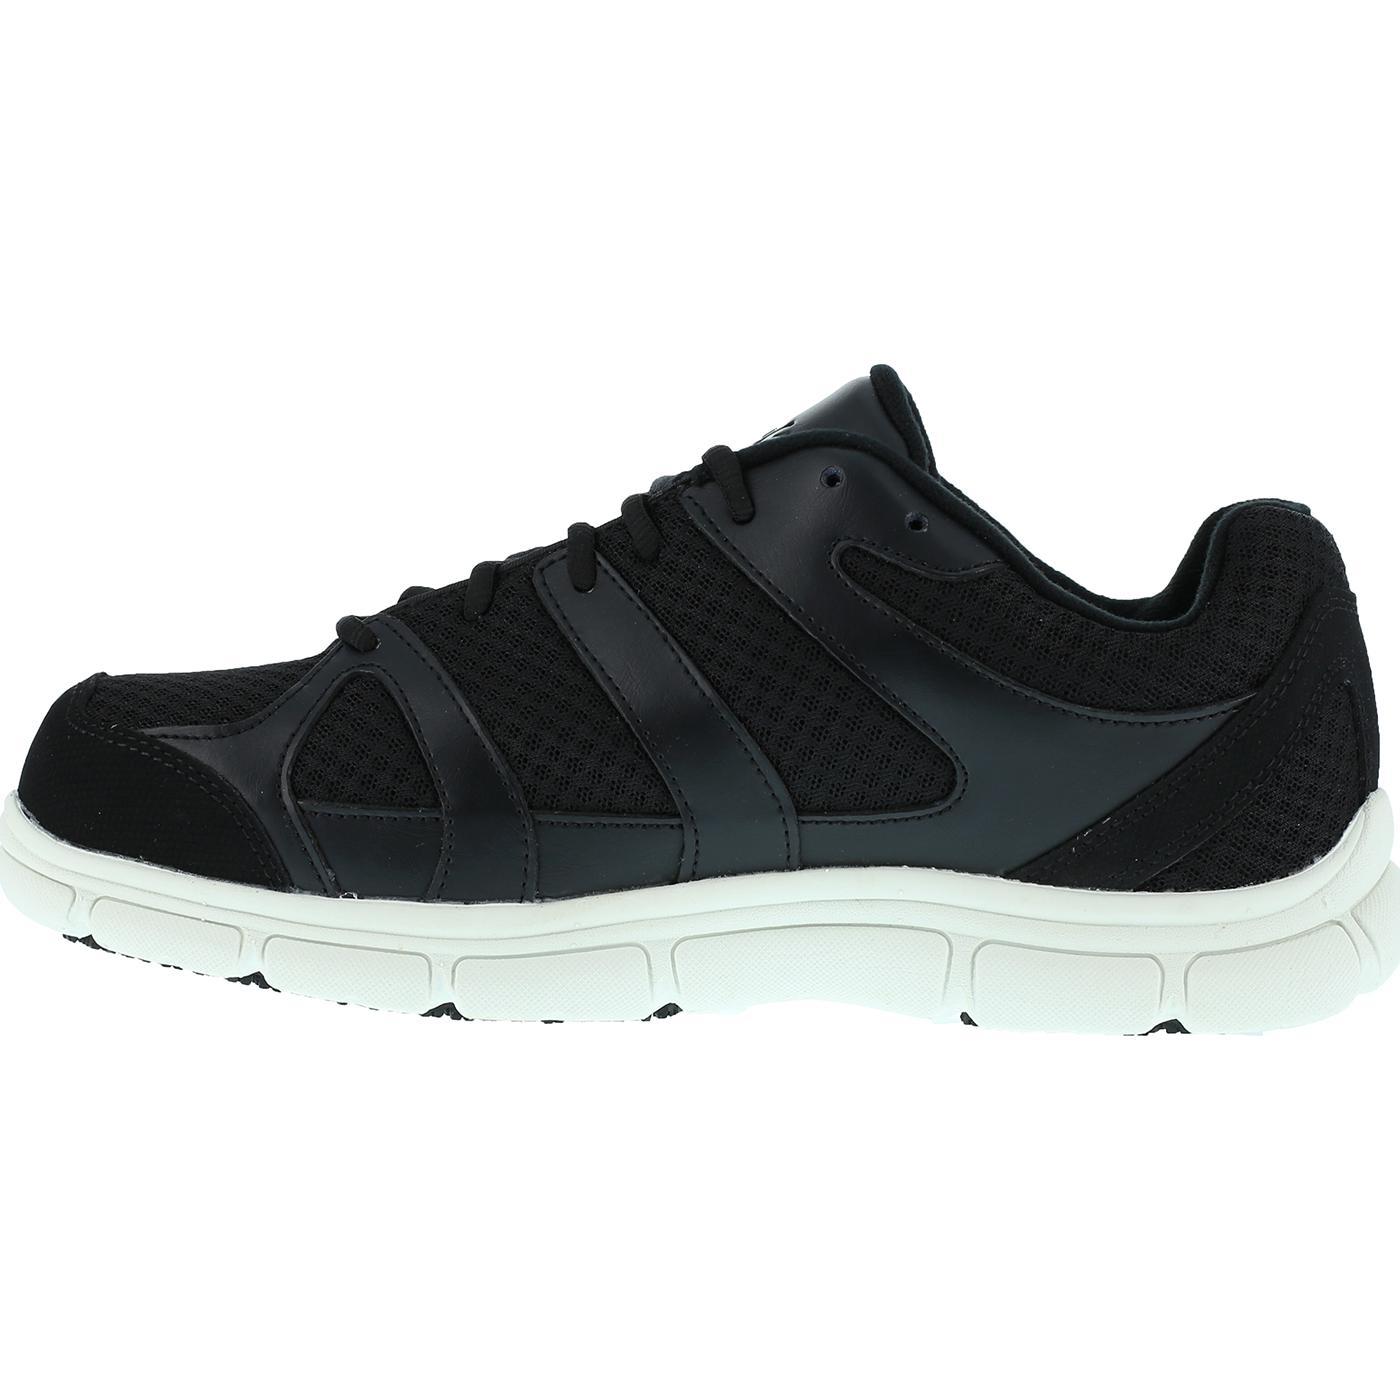 Reebok Work Shoes Non Slip